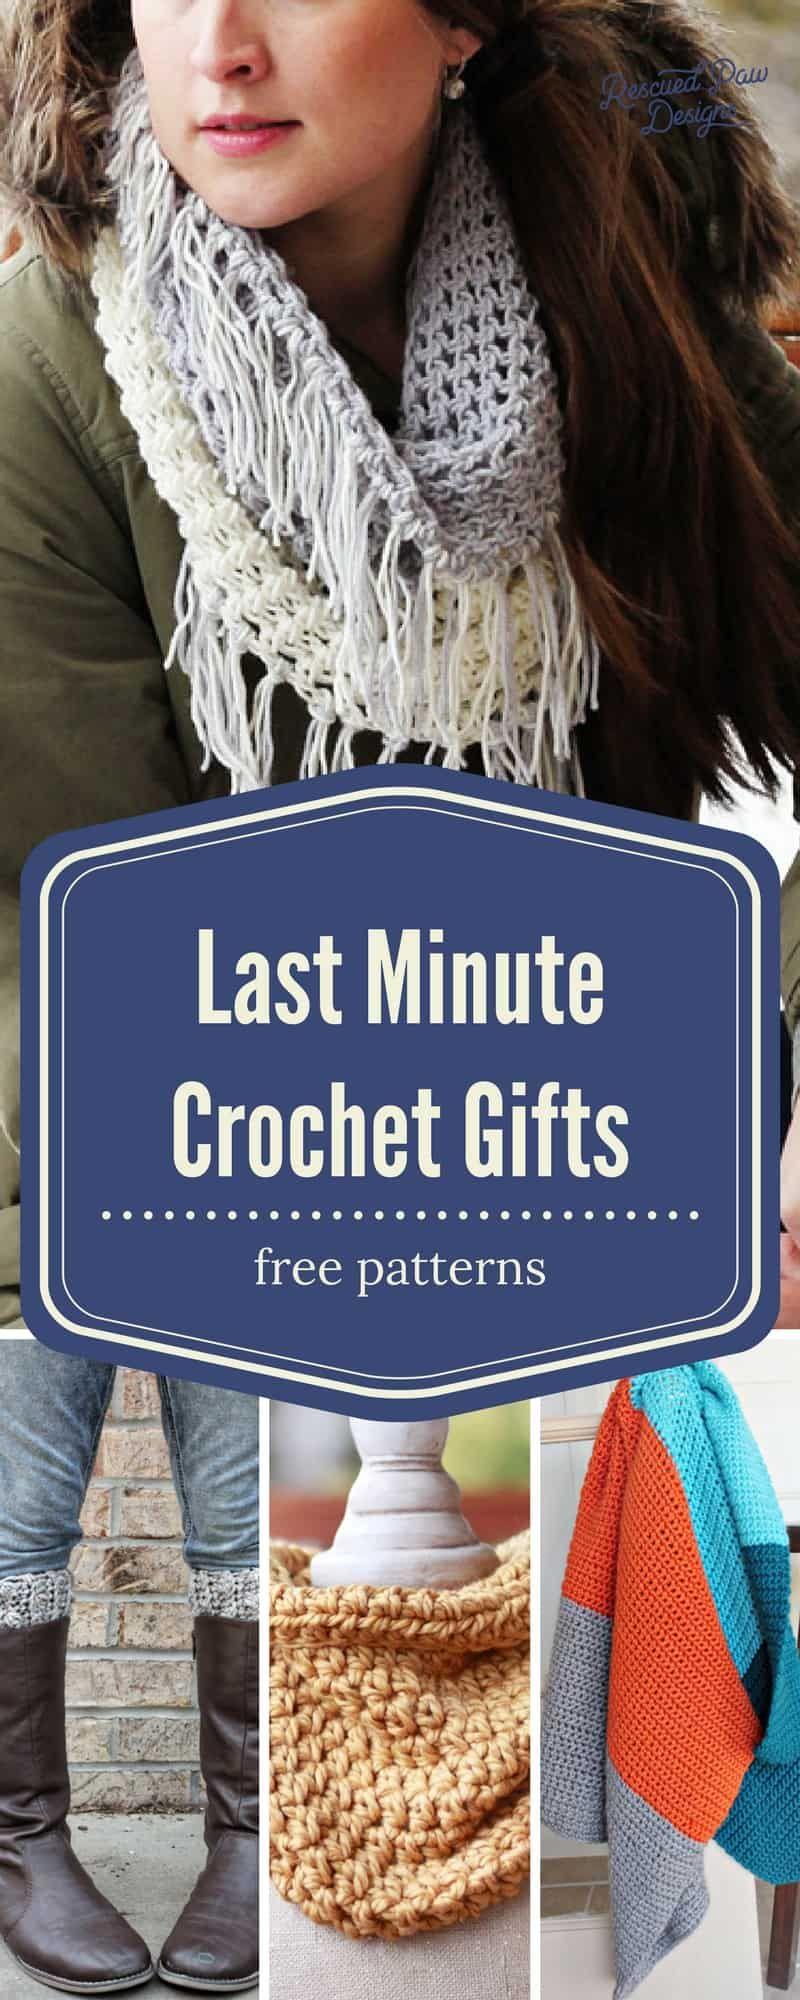 Make Crochet Christmas Gifts In A Weekend Gift Ideas Crochet